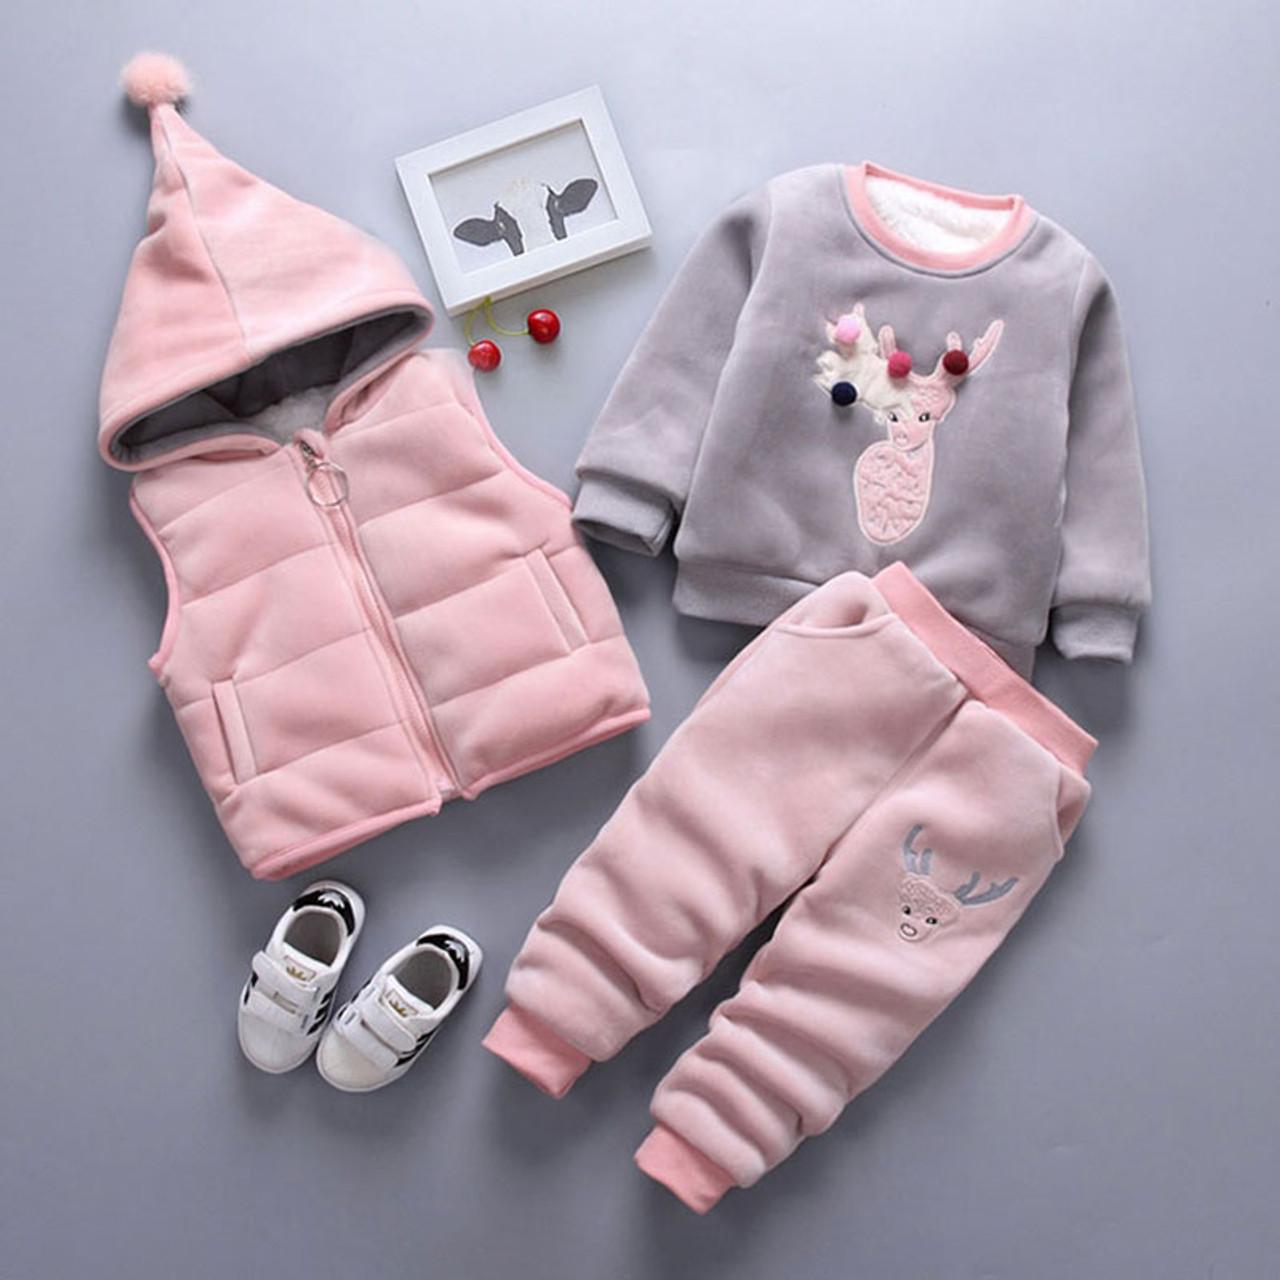 For Winter Newborn Infant Boys Girls Baby Clothes Velvet Tops Pullover Sweatshirt Vest Jacket Pants Outfits Sport Clothing Sets Onshopdeals Com